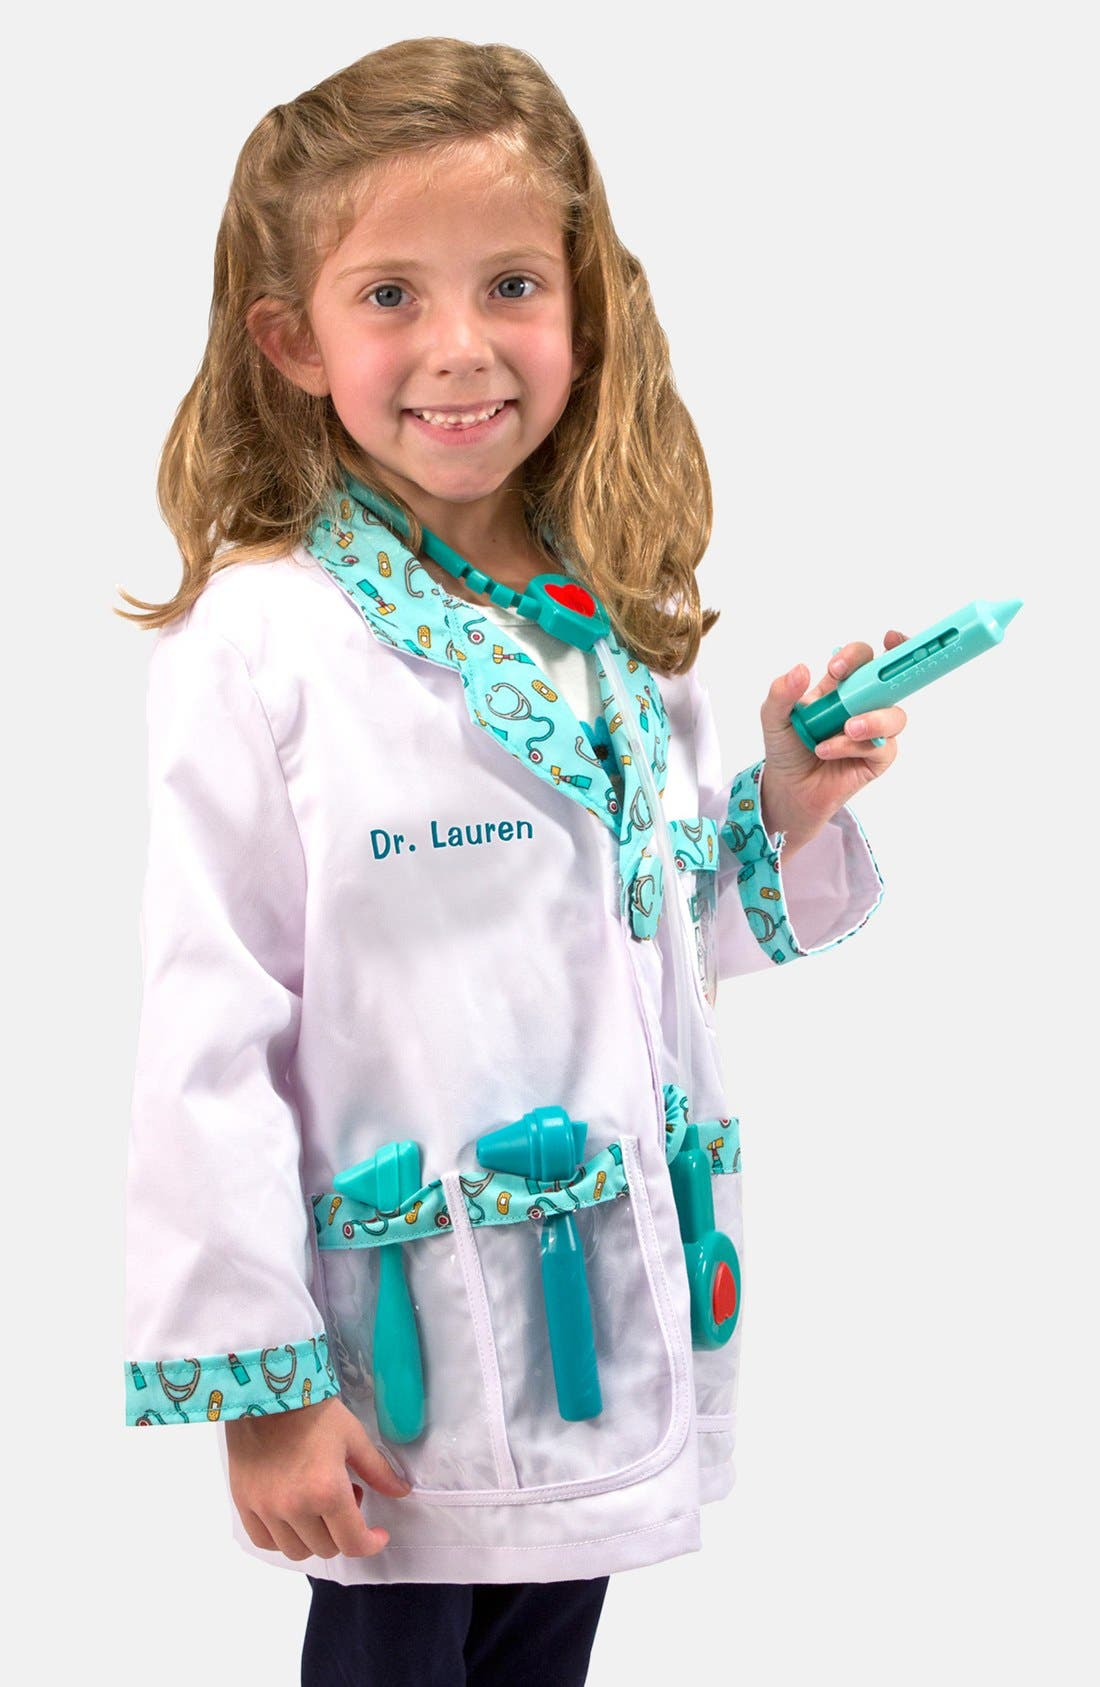 Main Image - Melissa & Doug 'Doctor' Personalized Costume Set (Little Kid)